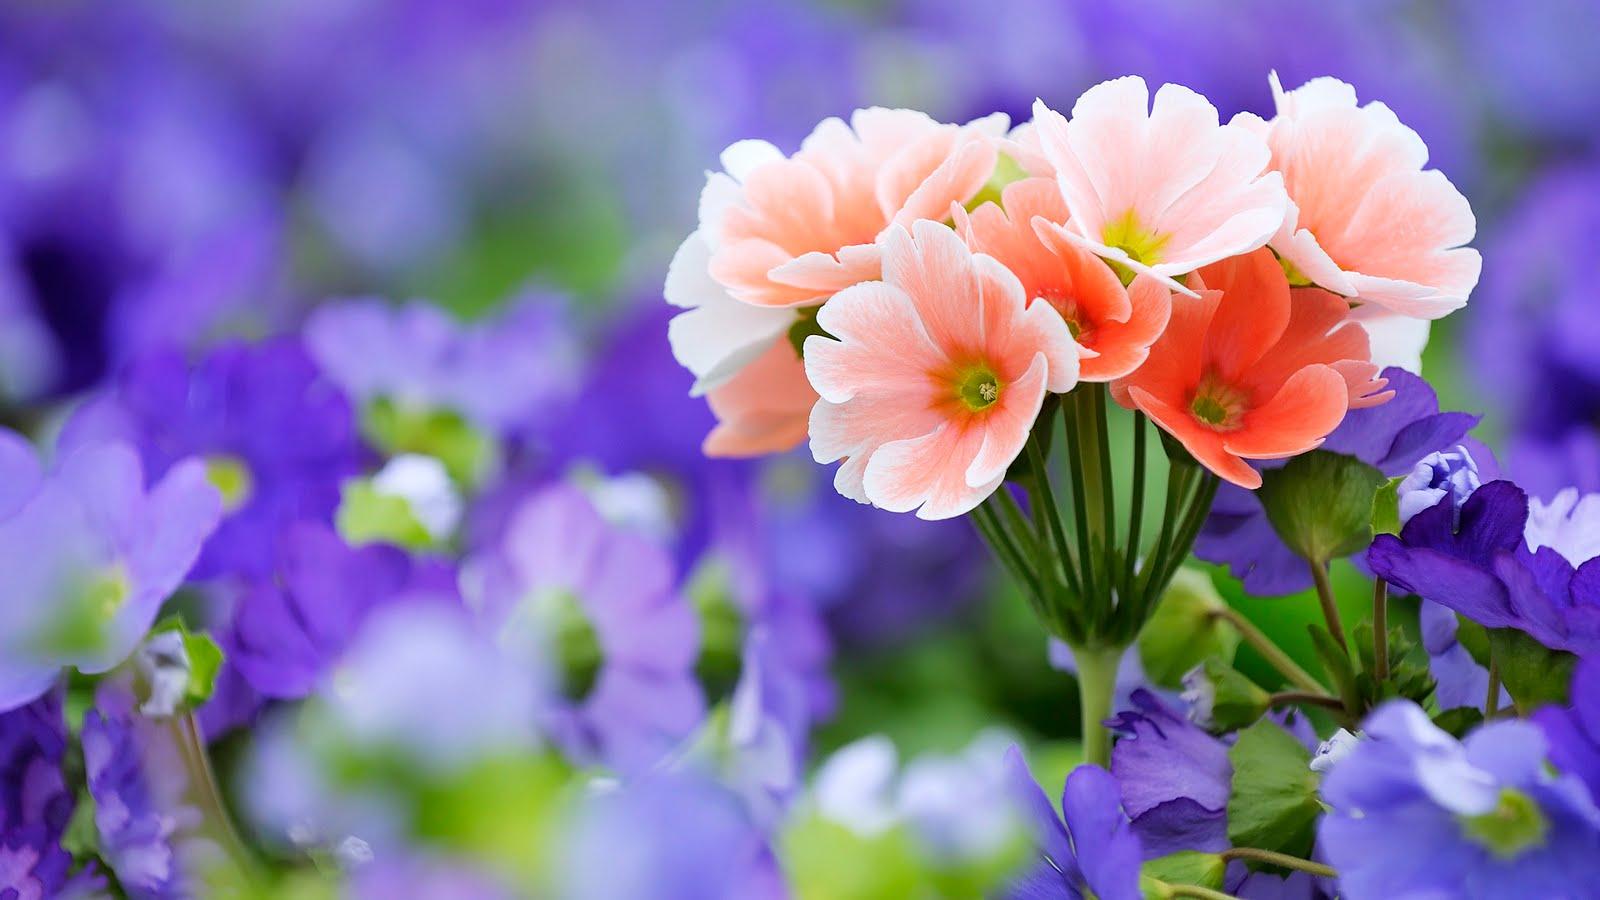 [Imagen: flores2by2bflowers2bby2bwww-bancodeimage...-com-1.jpg]